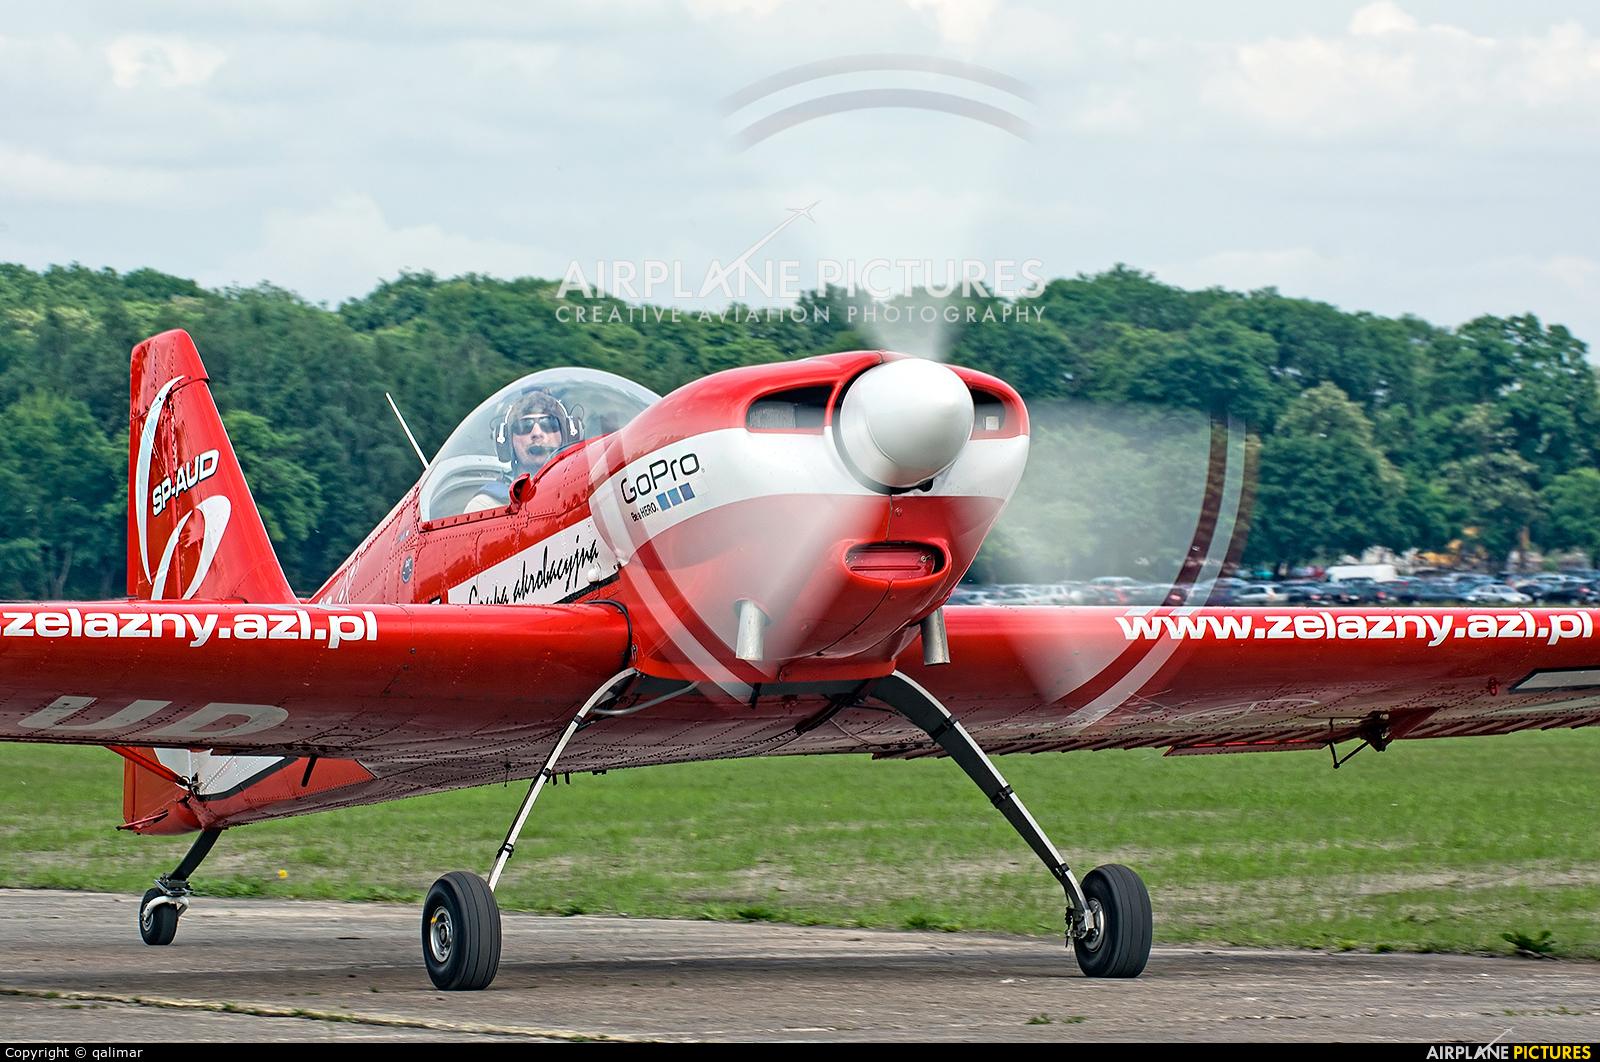 Grupa Akrobacyjna Żelazny - Acrobatic Group SP-AUD aircraft at Płock